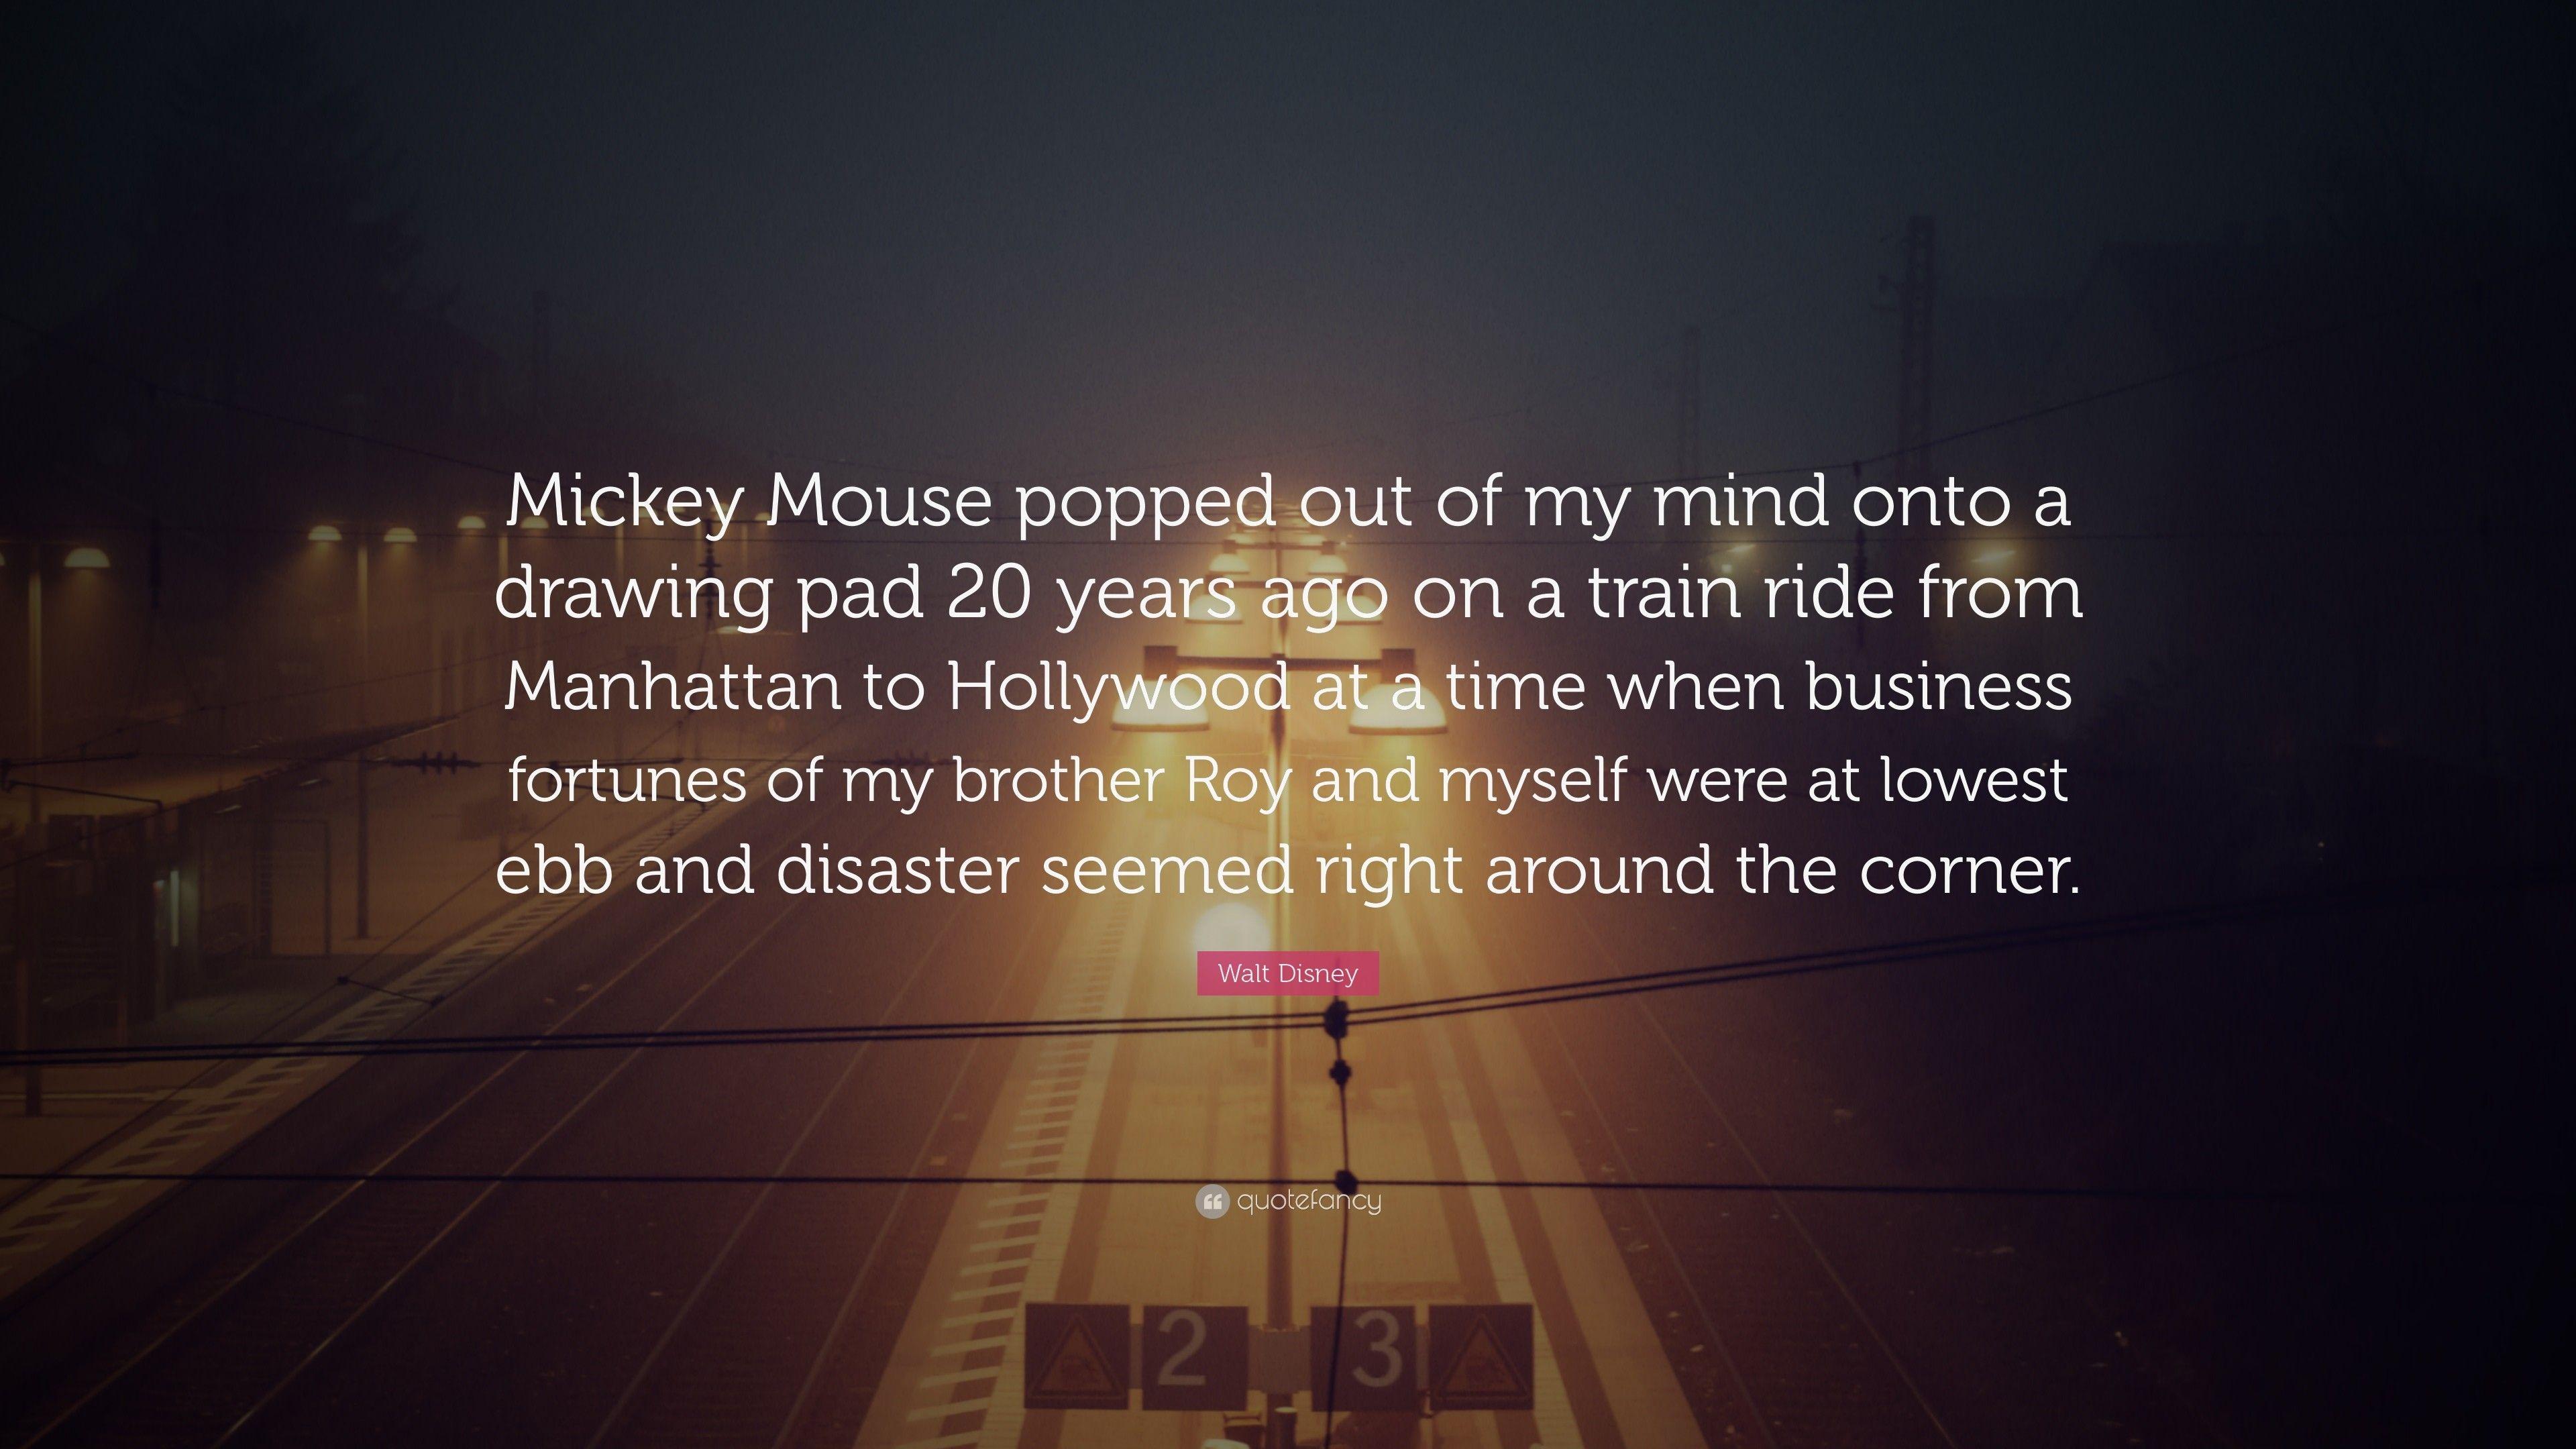 Inspirational Walt Disney Quote Wallpapers On Wallpaperdog